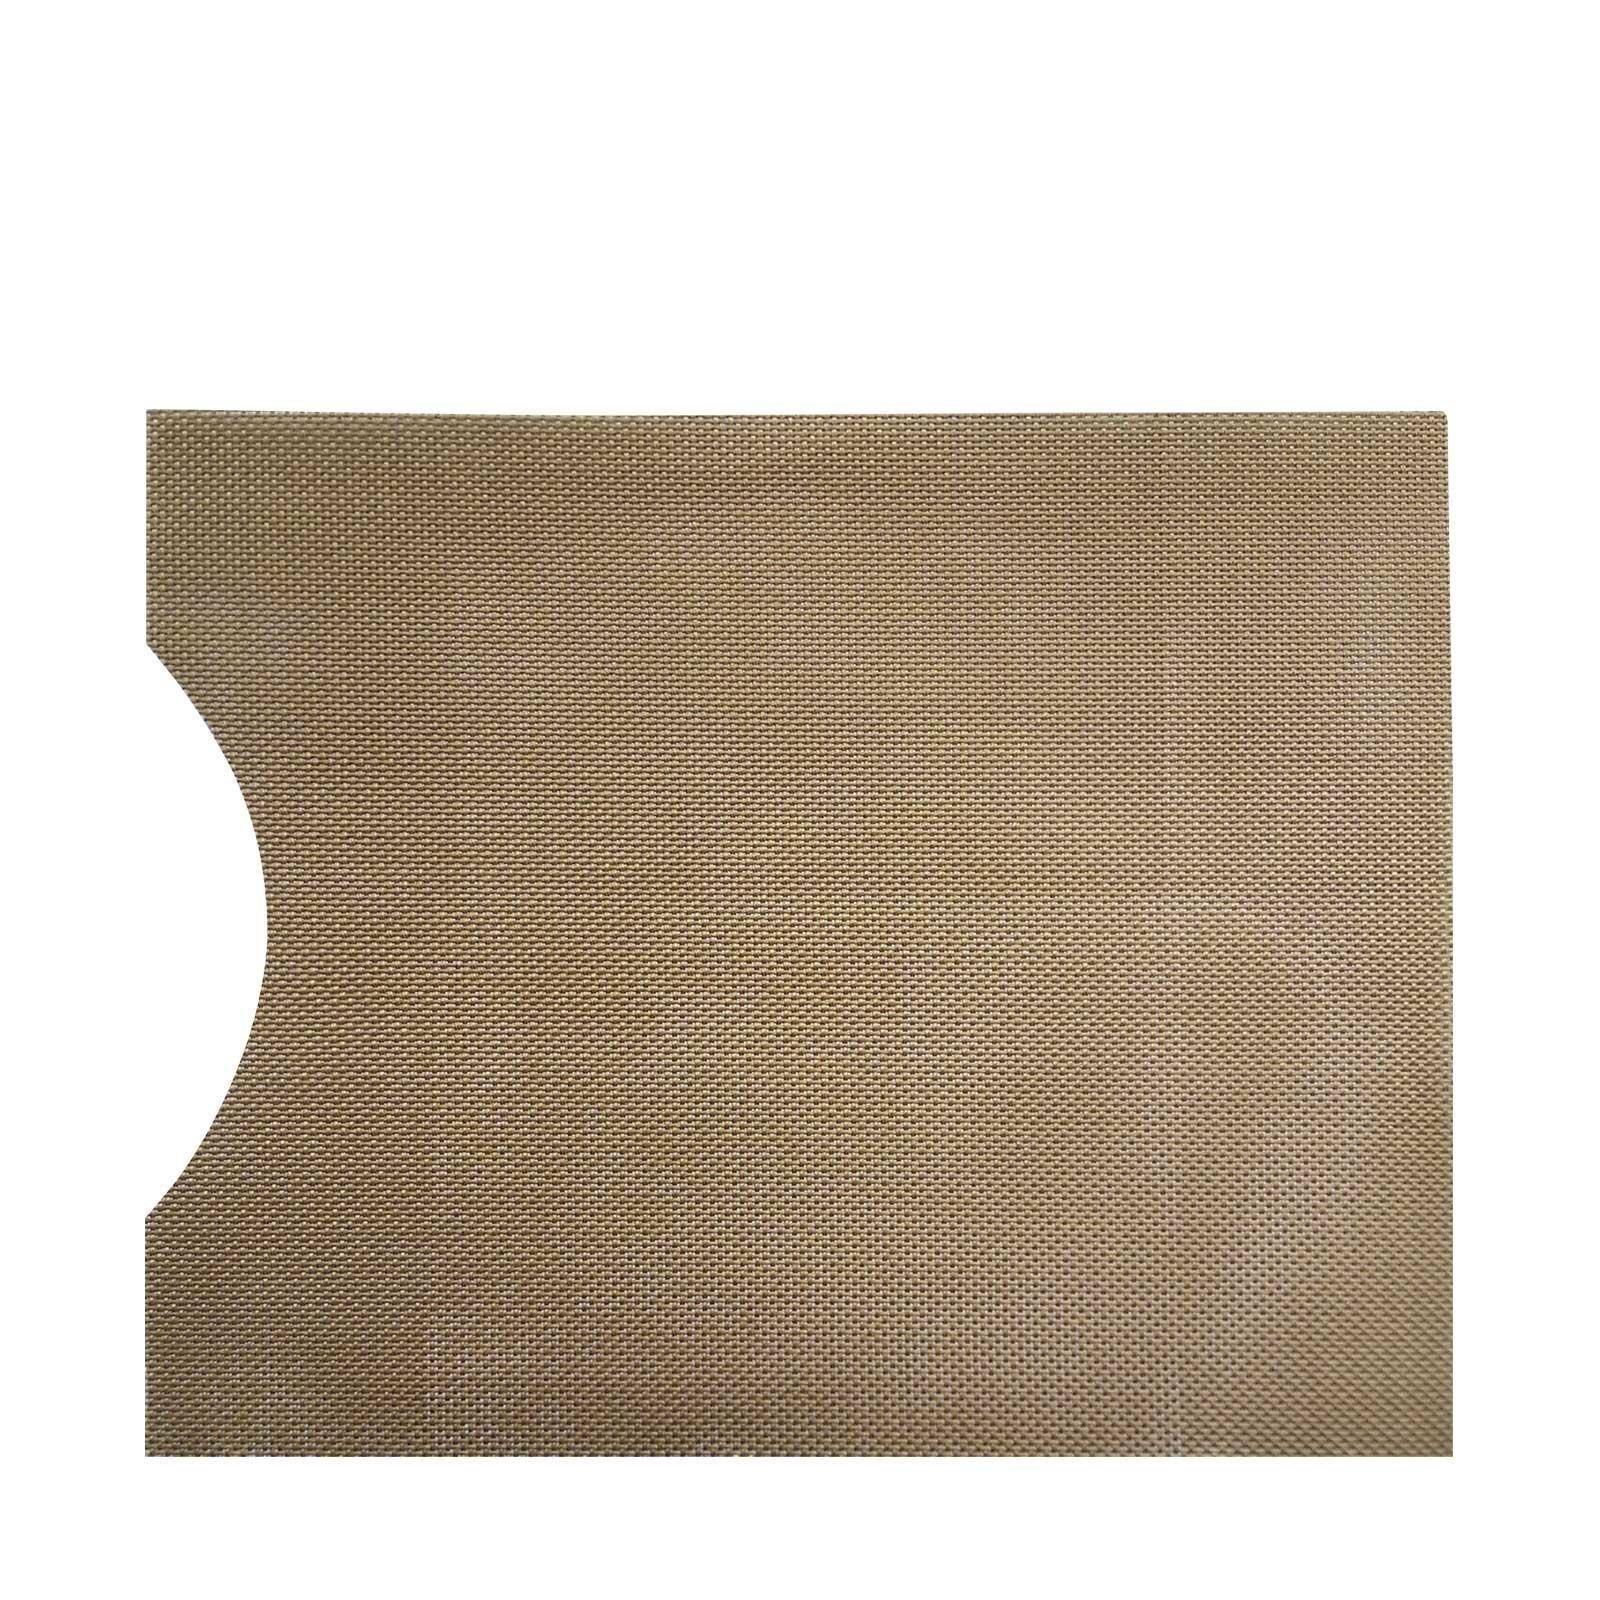 BioChef Arizona 8/10 Tray Mesh Sheet - 8 Packs